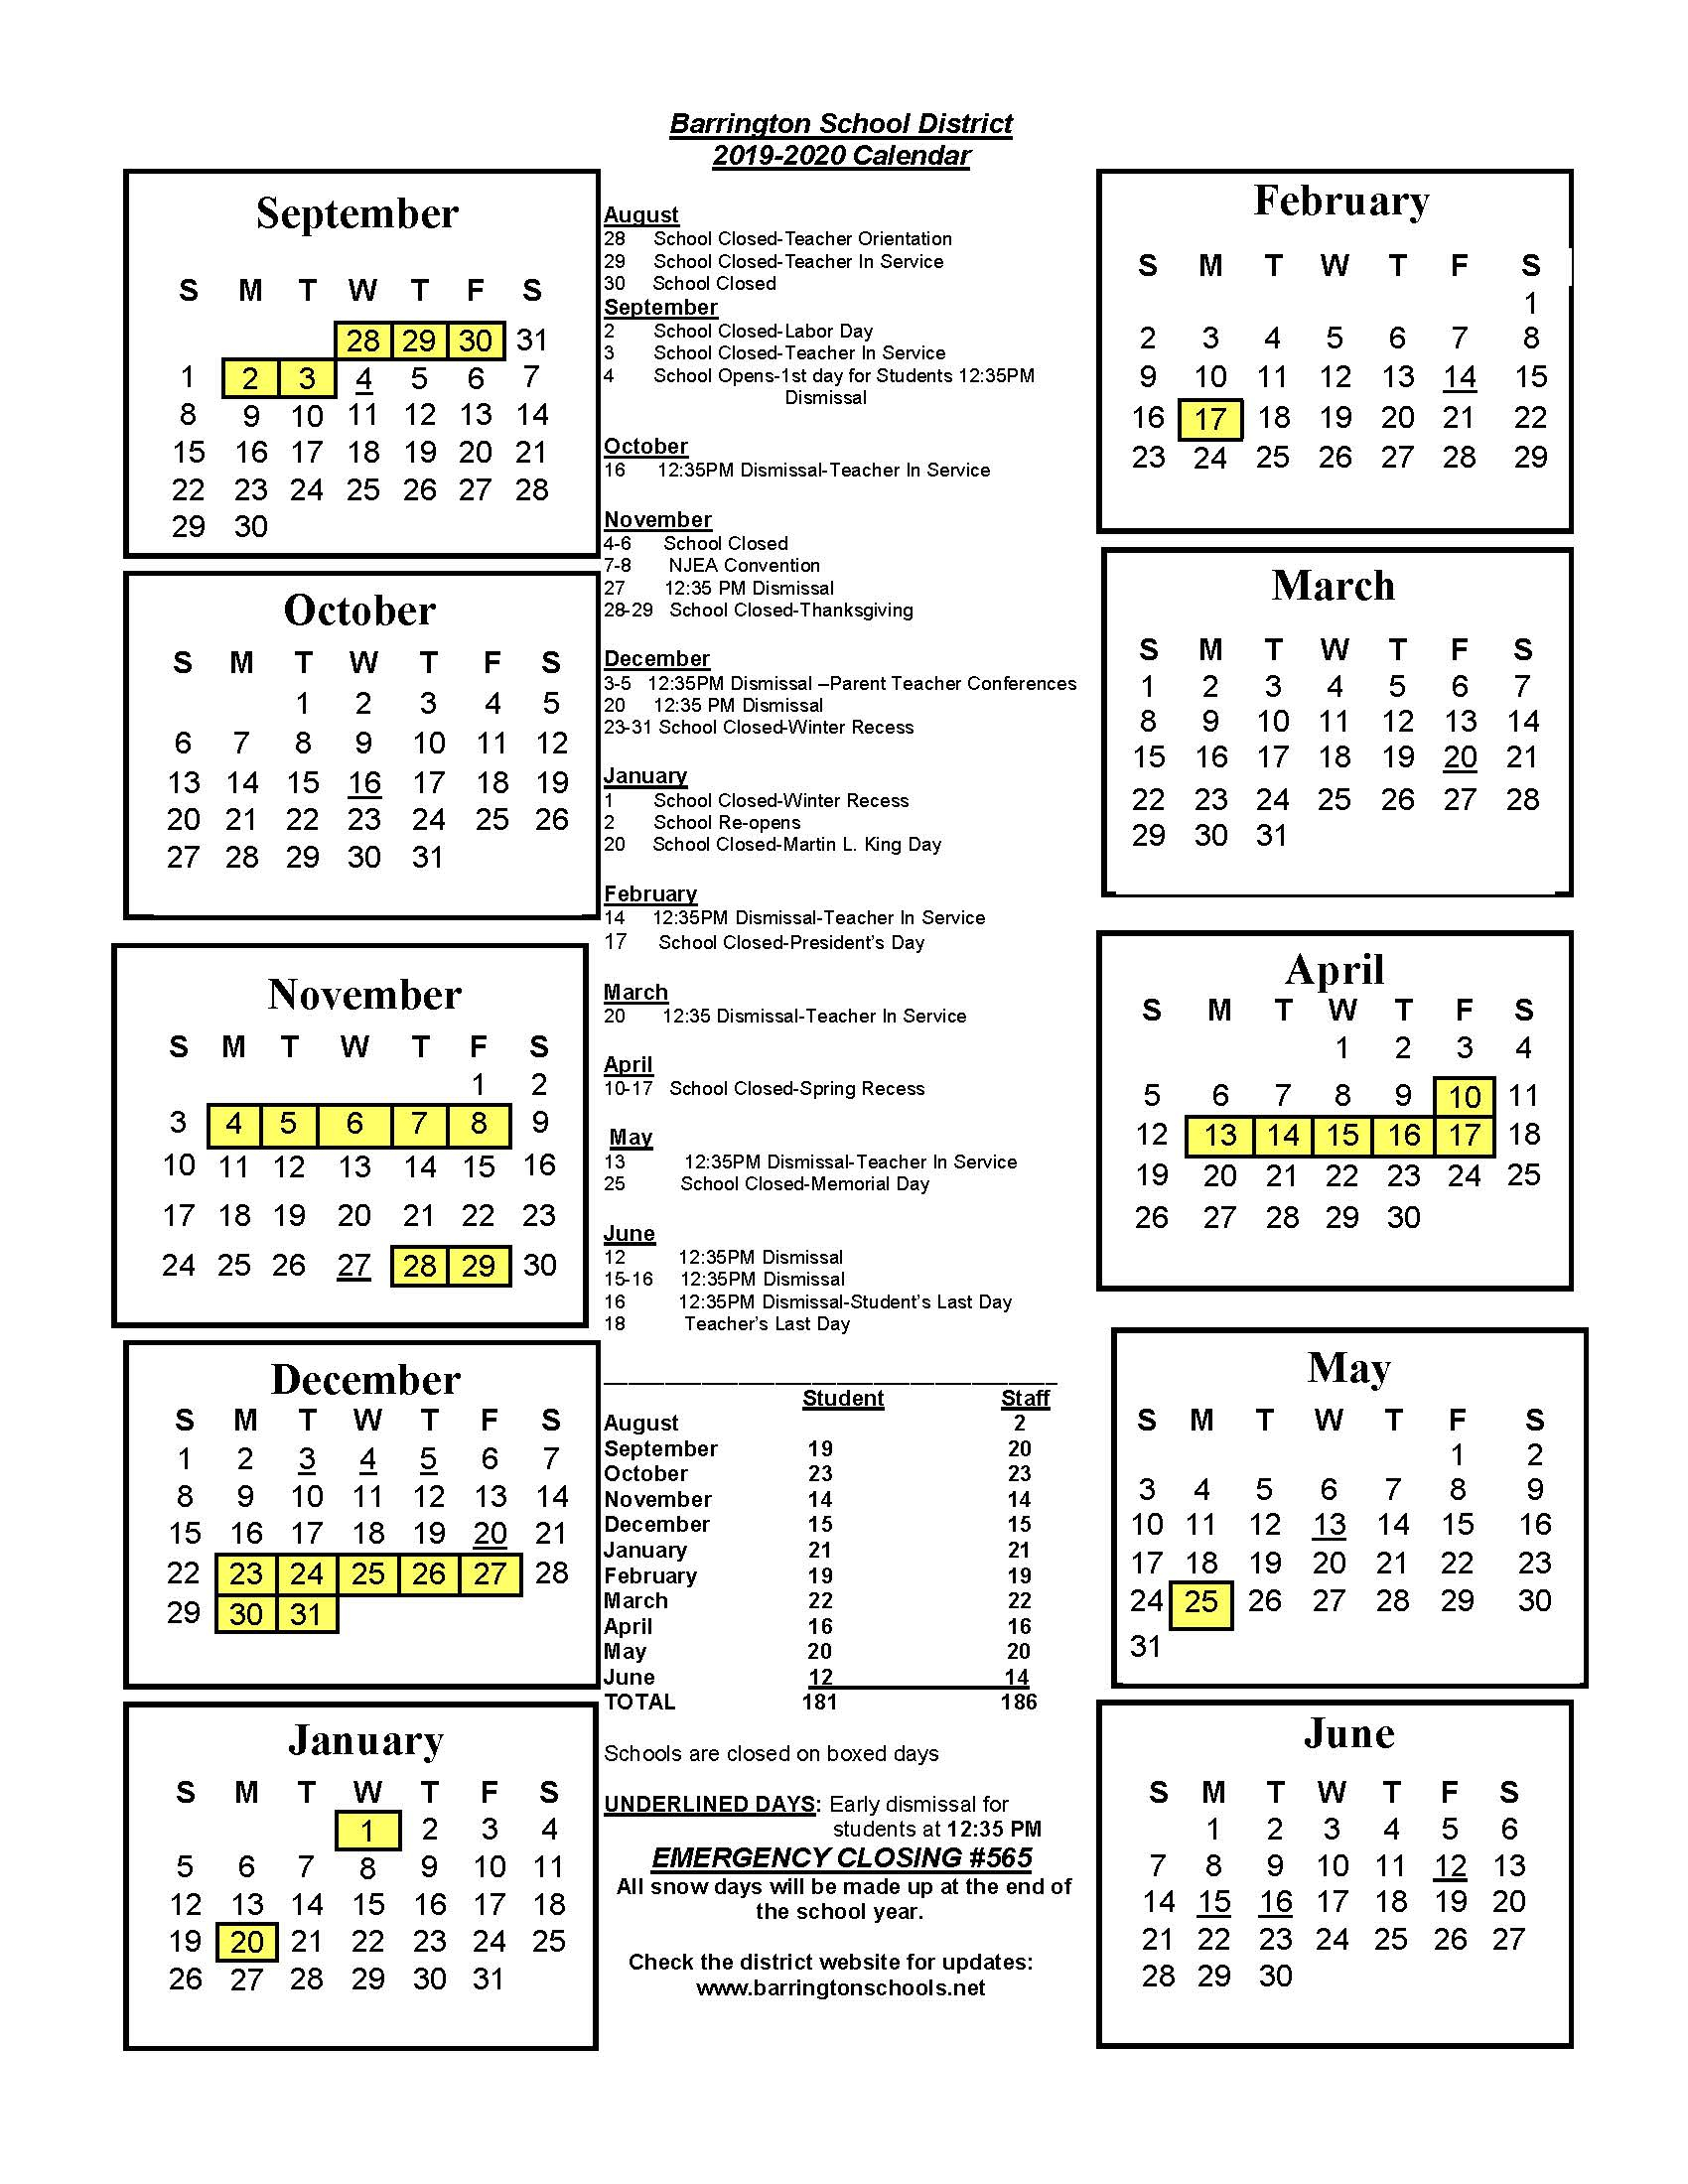 District Calendar - Barrington School District Within New Jersey School Public Educatiom Calendar